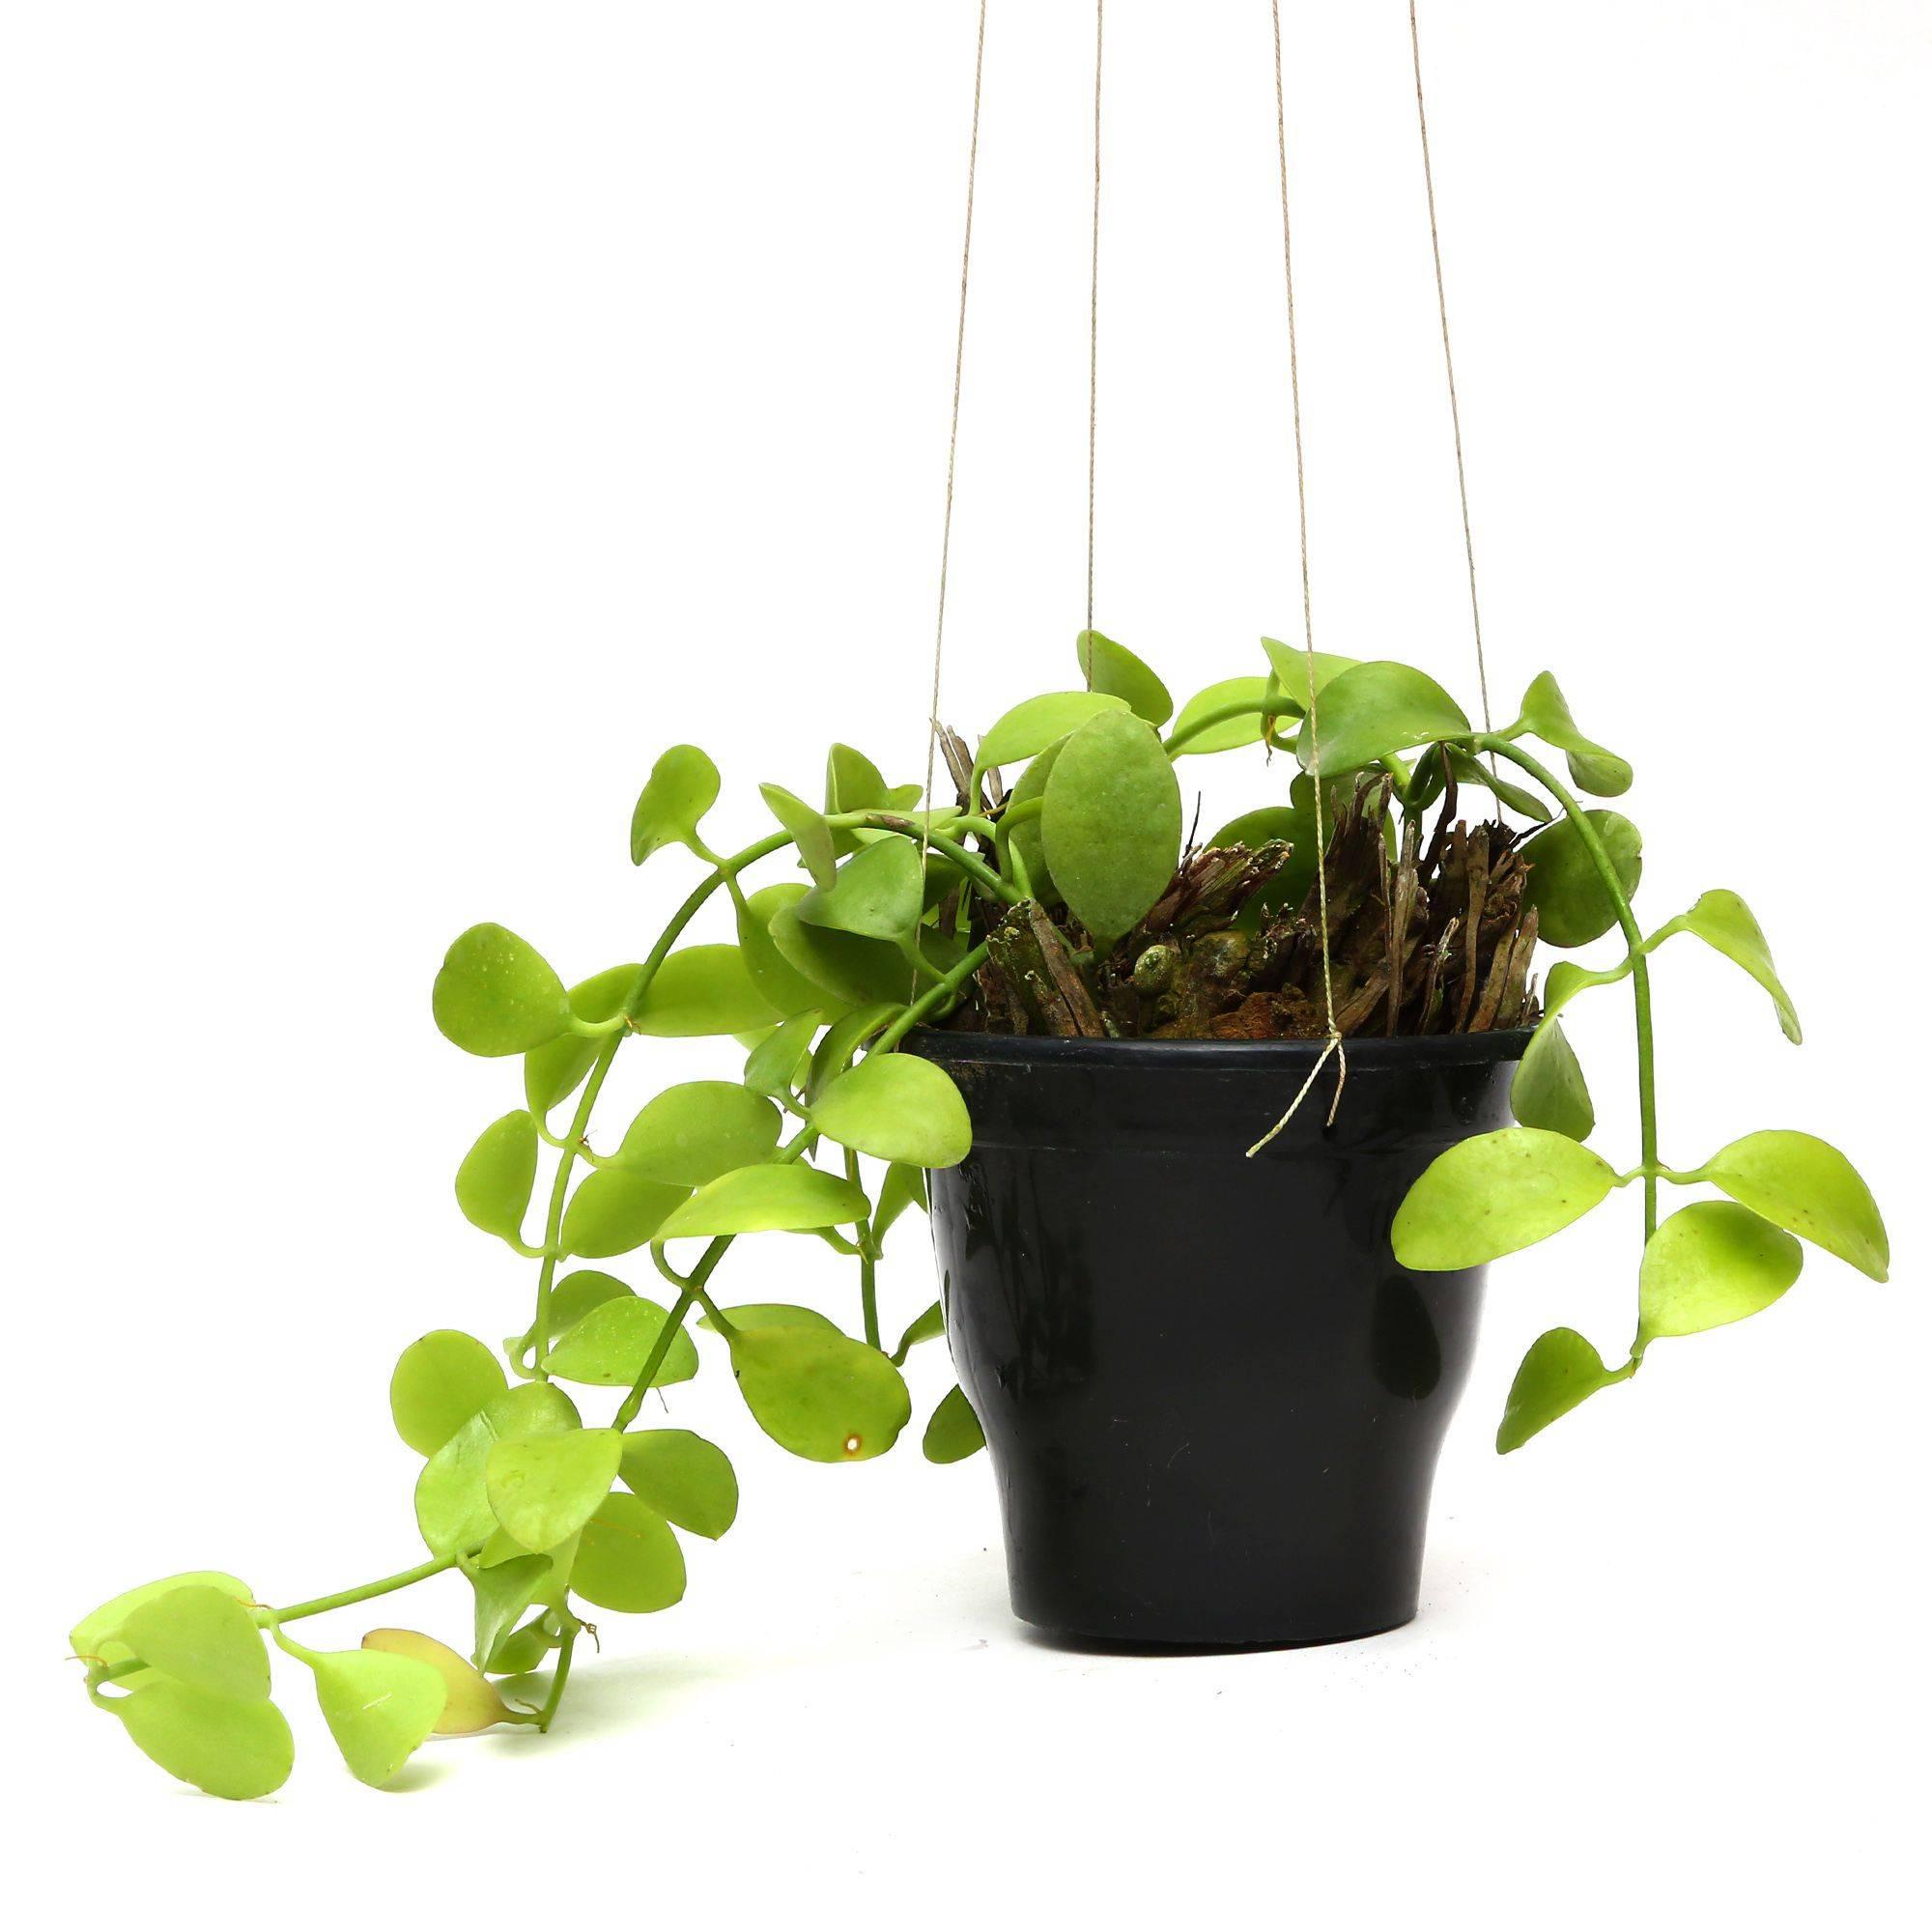 Plants Pots Hanging Hoya Plants SDL 1 JPG